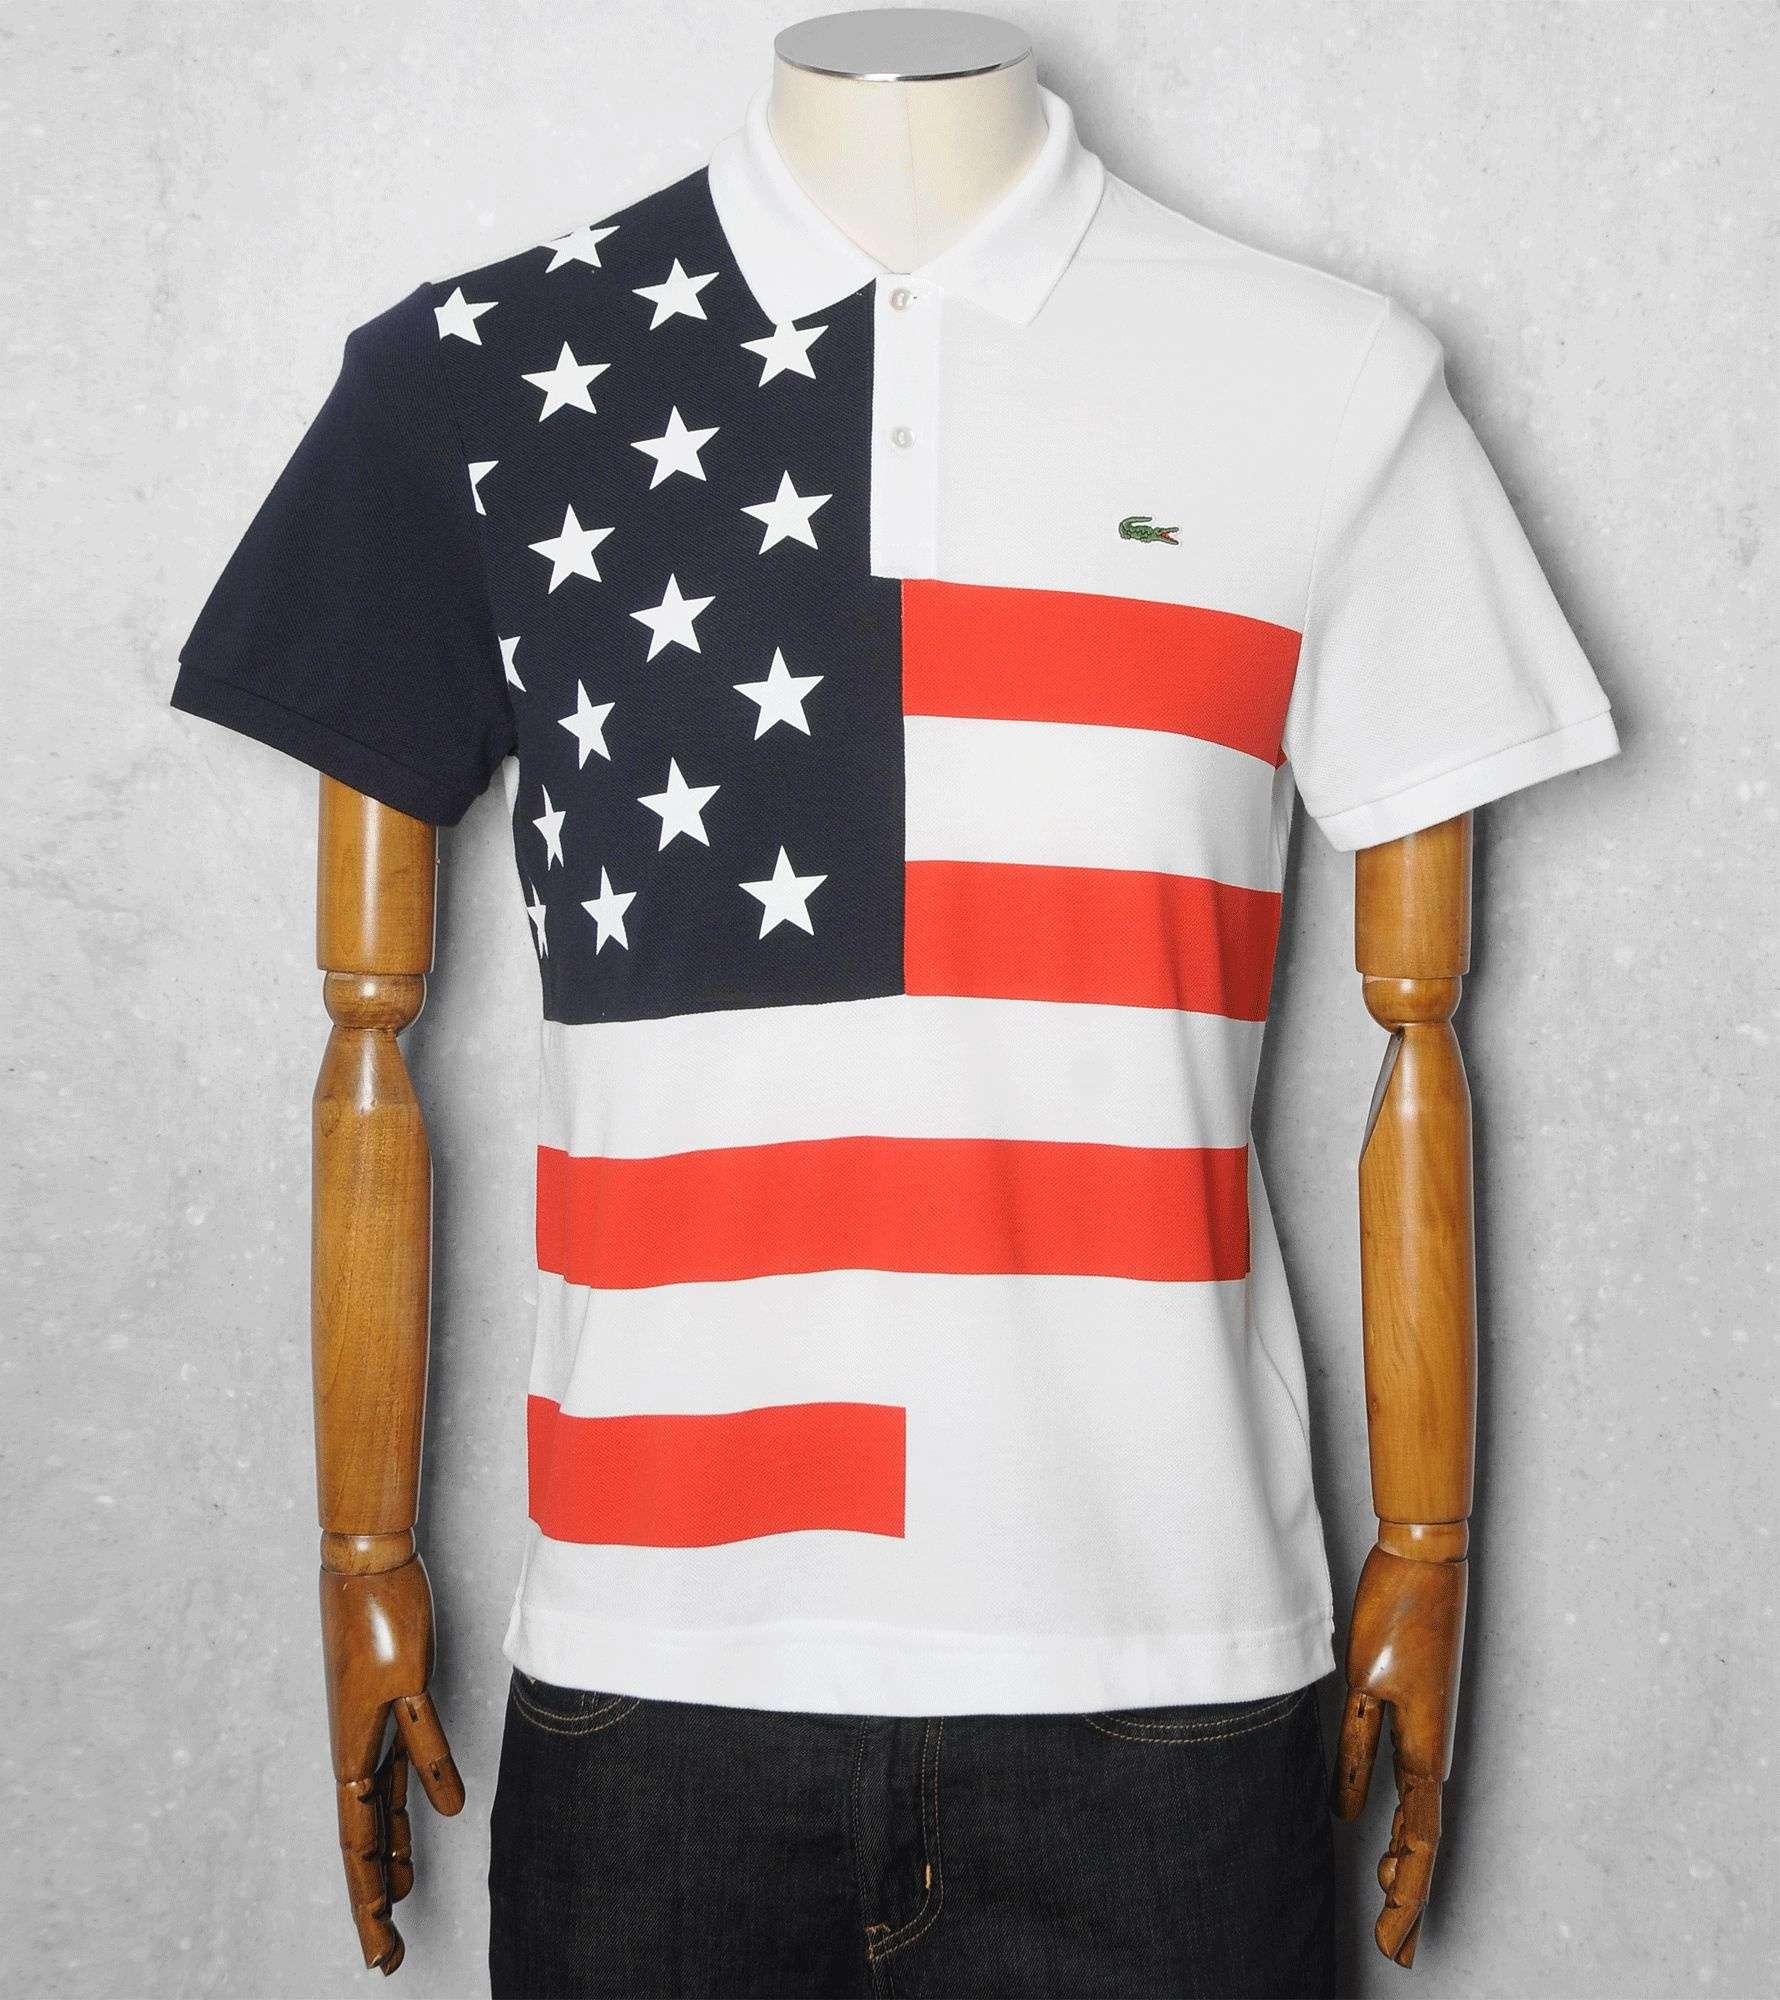 b694fc911dbafc Lacoste USA Flag Polo Shirt